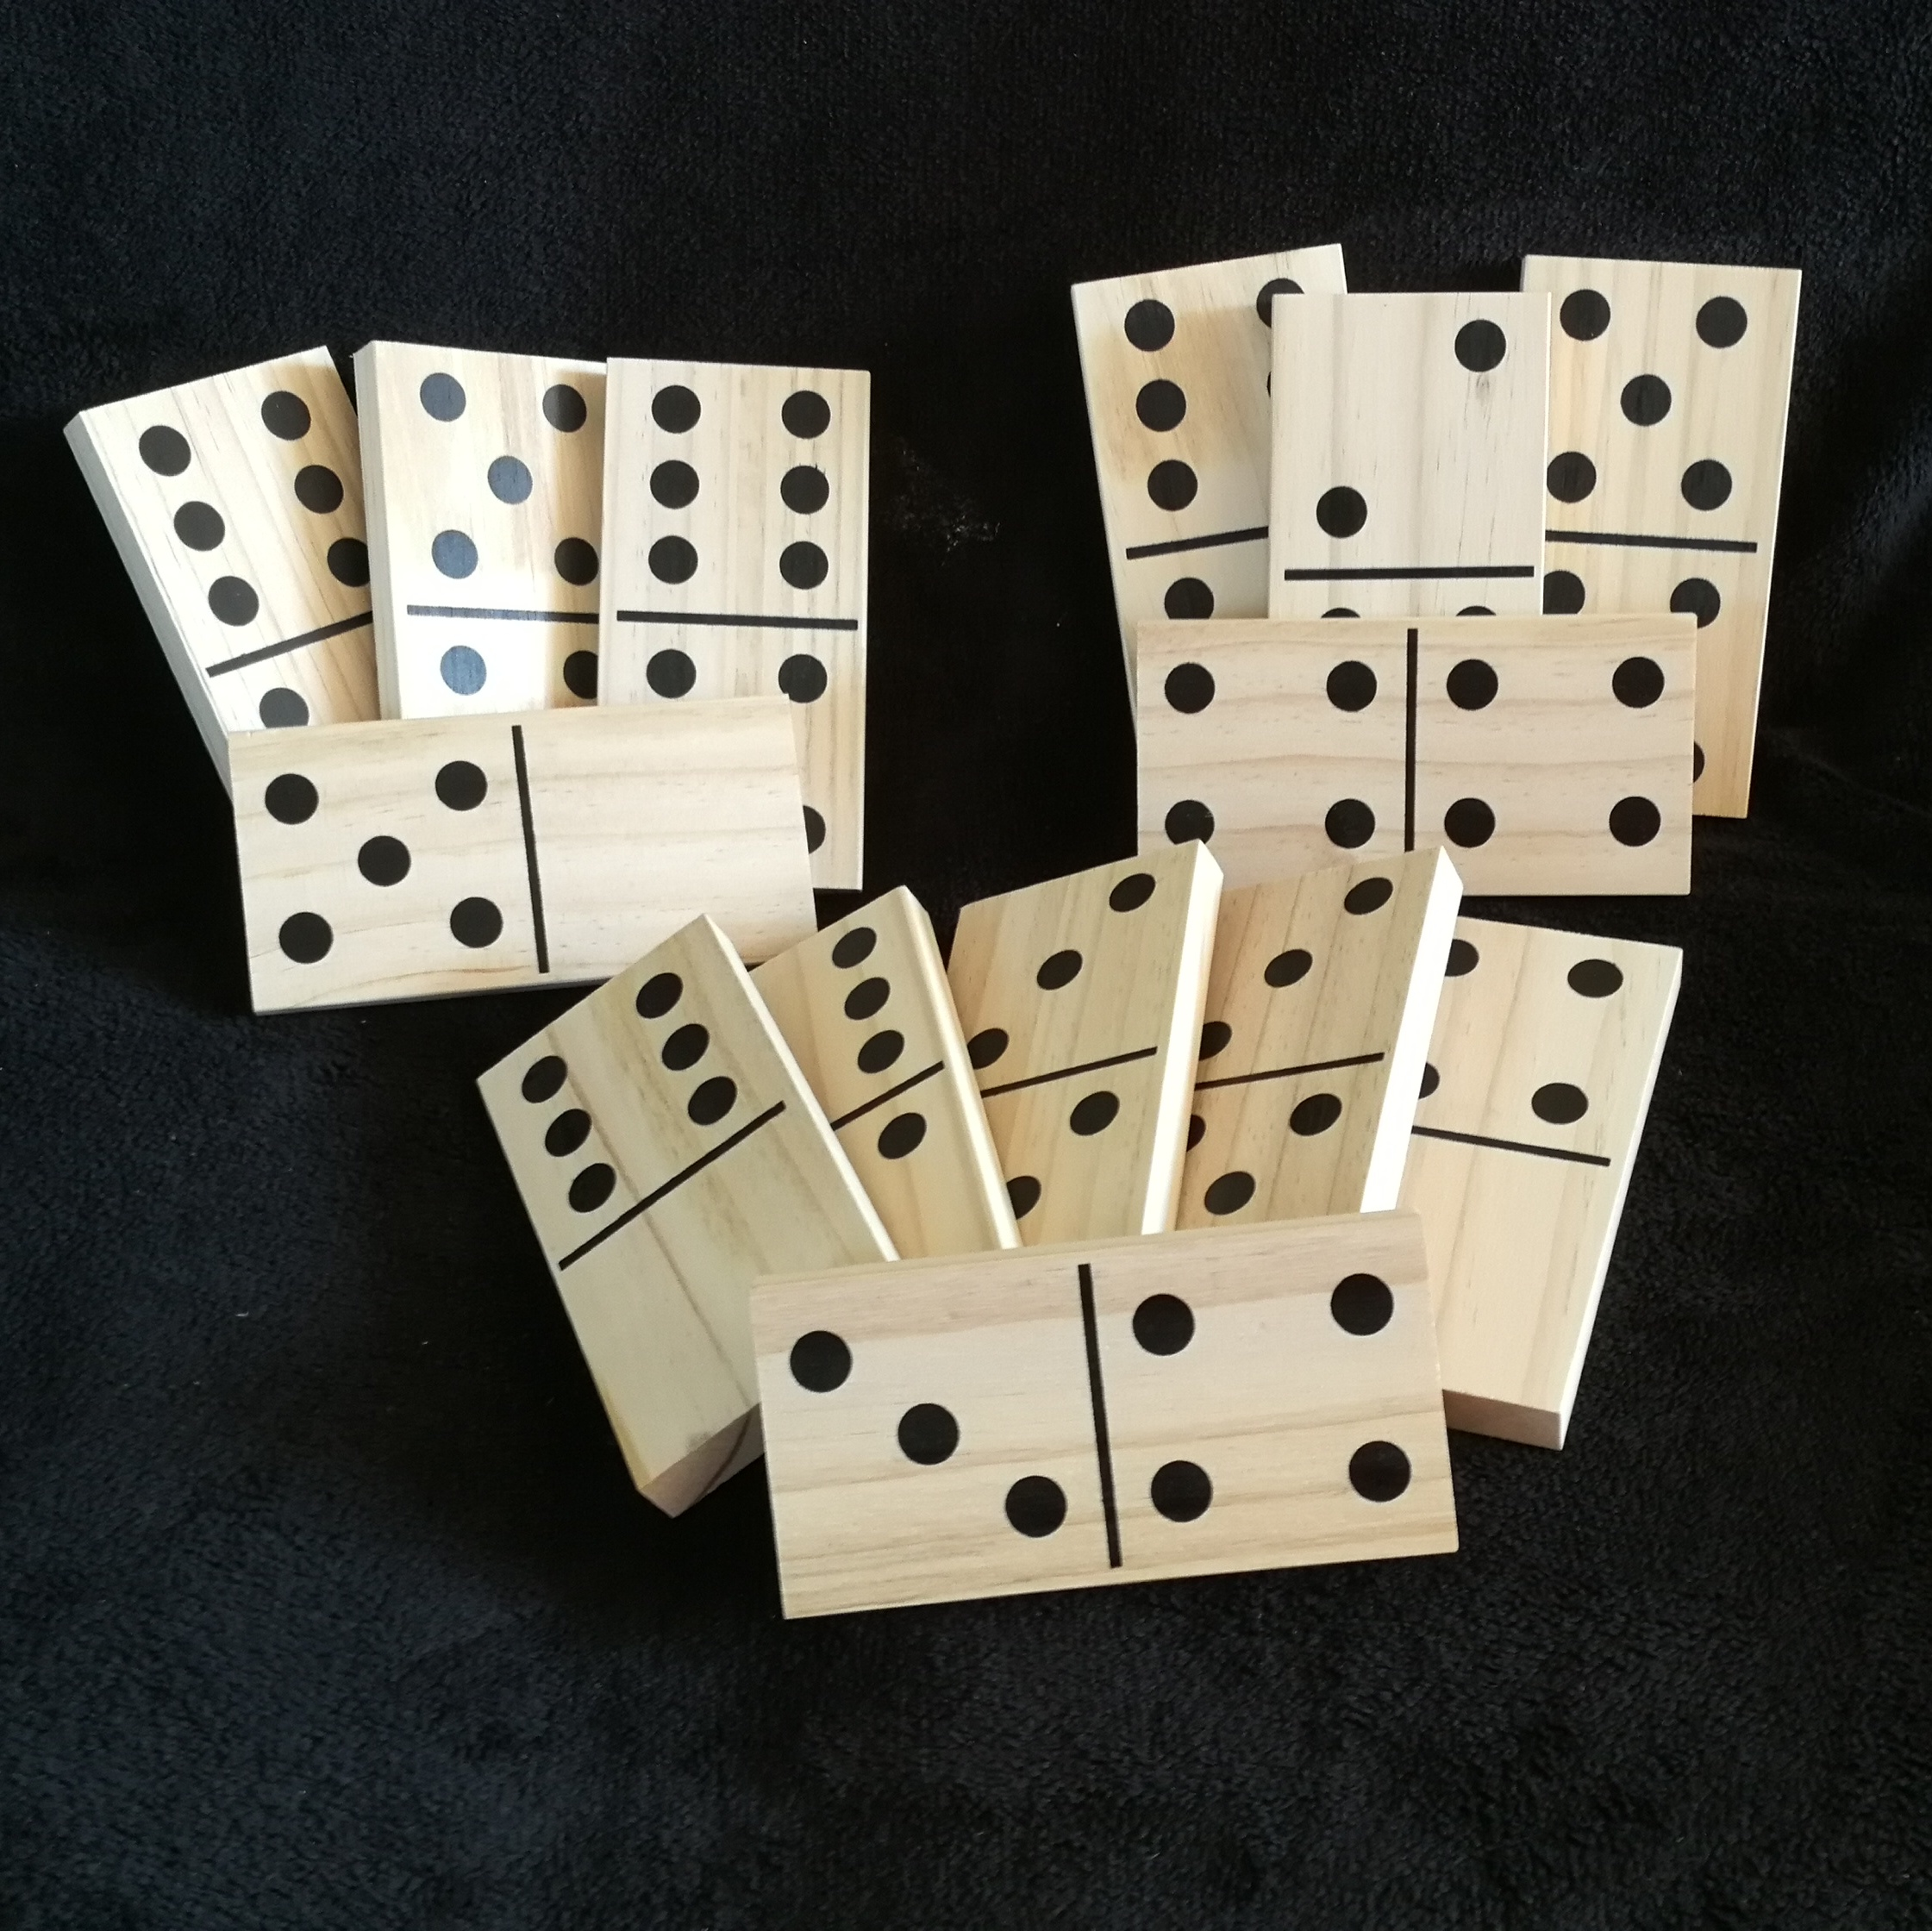 XL domino